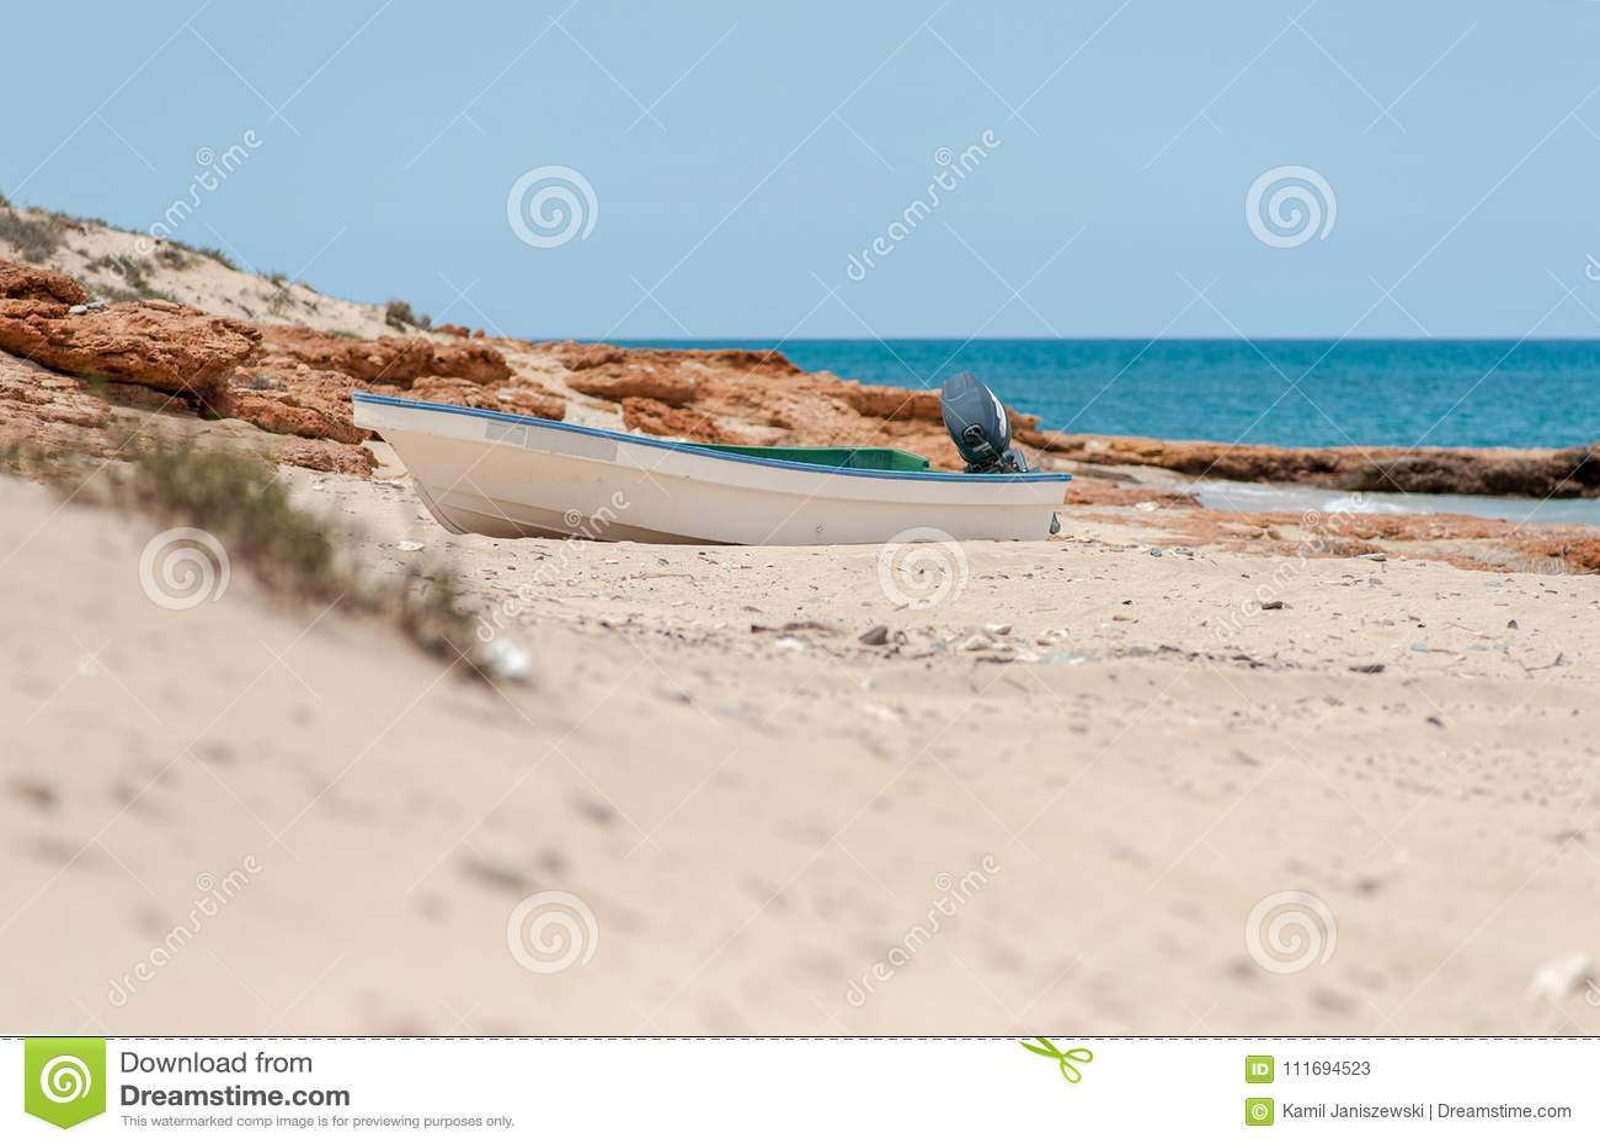 Fishing Boat At Beach  Omani Gulf, Arabic Sea, Oman, Asia